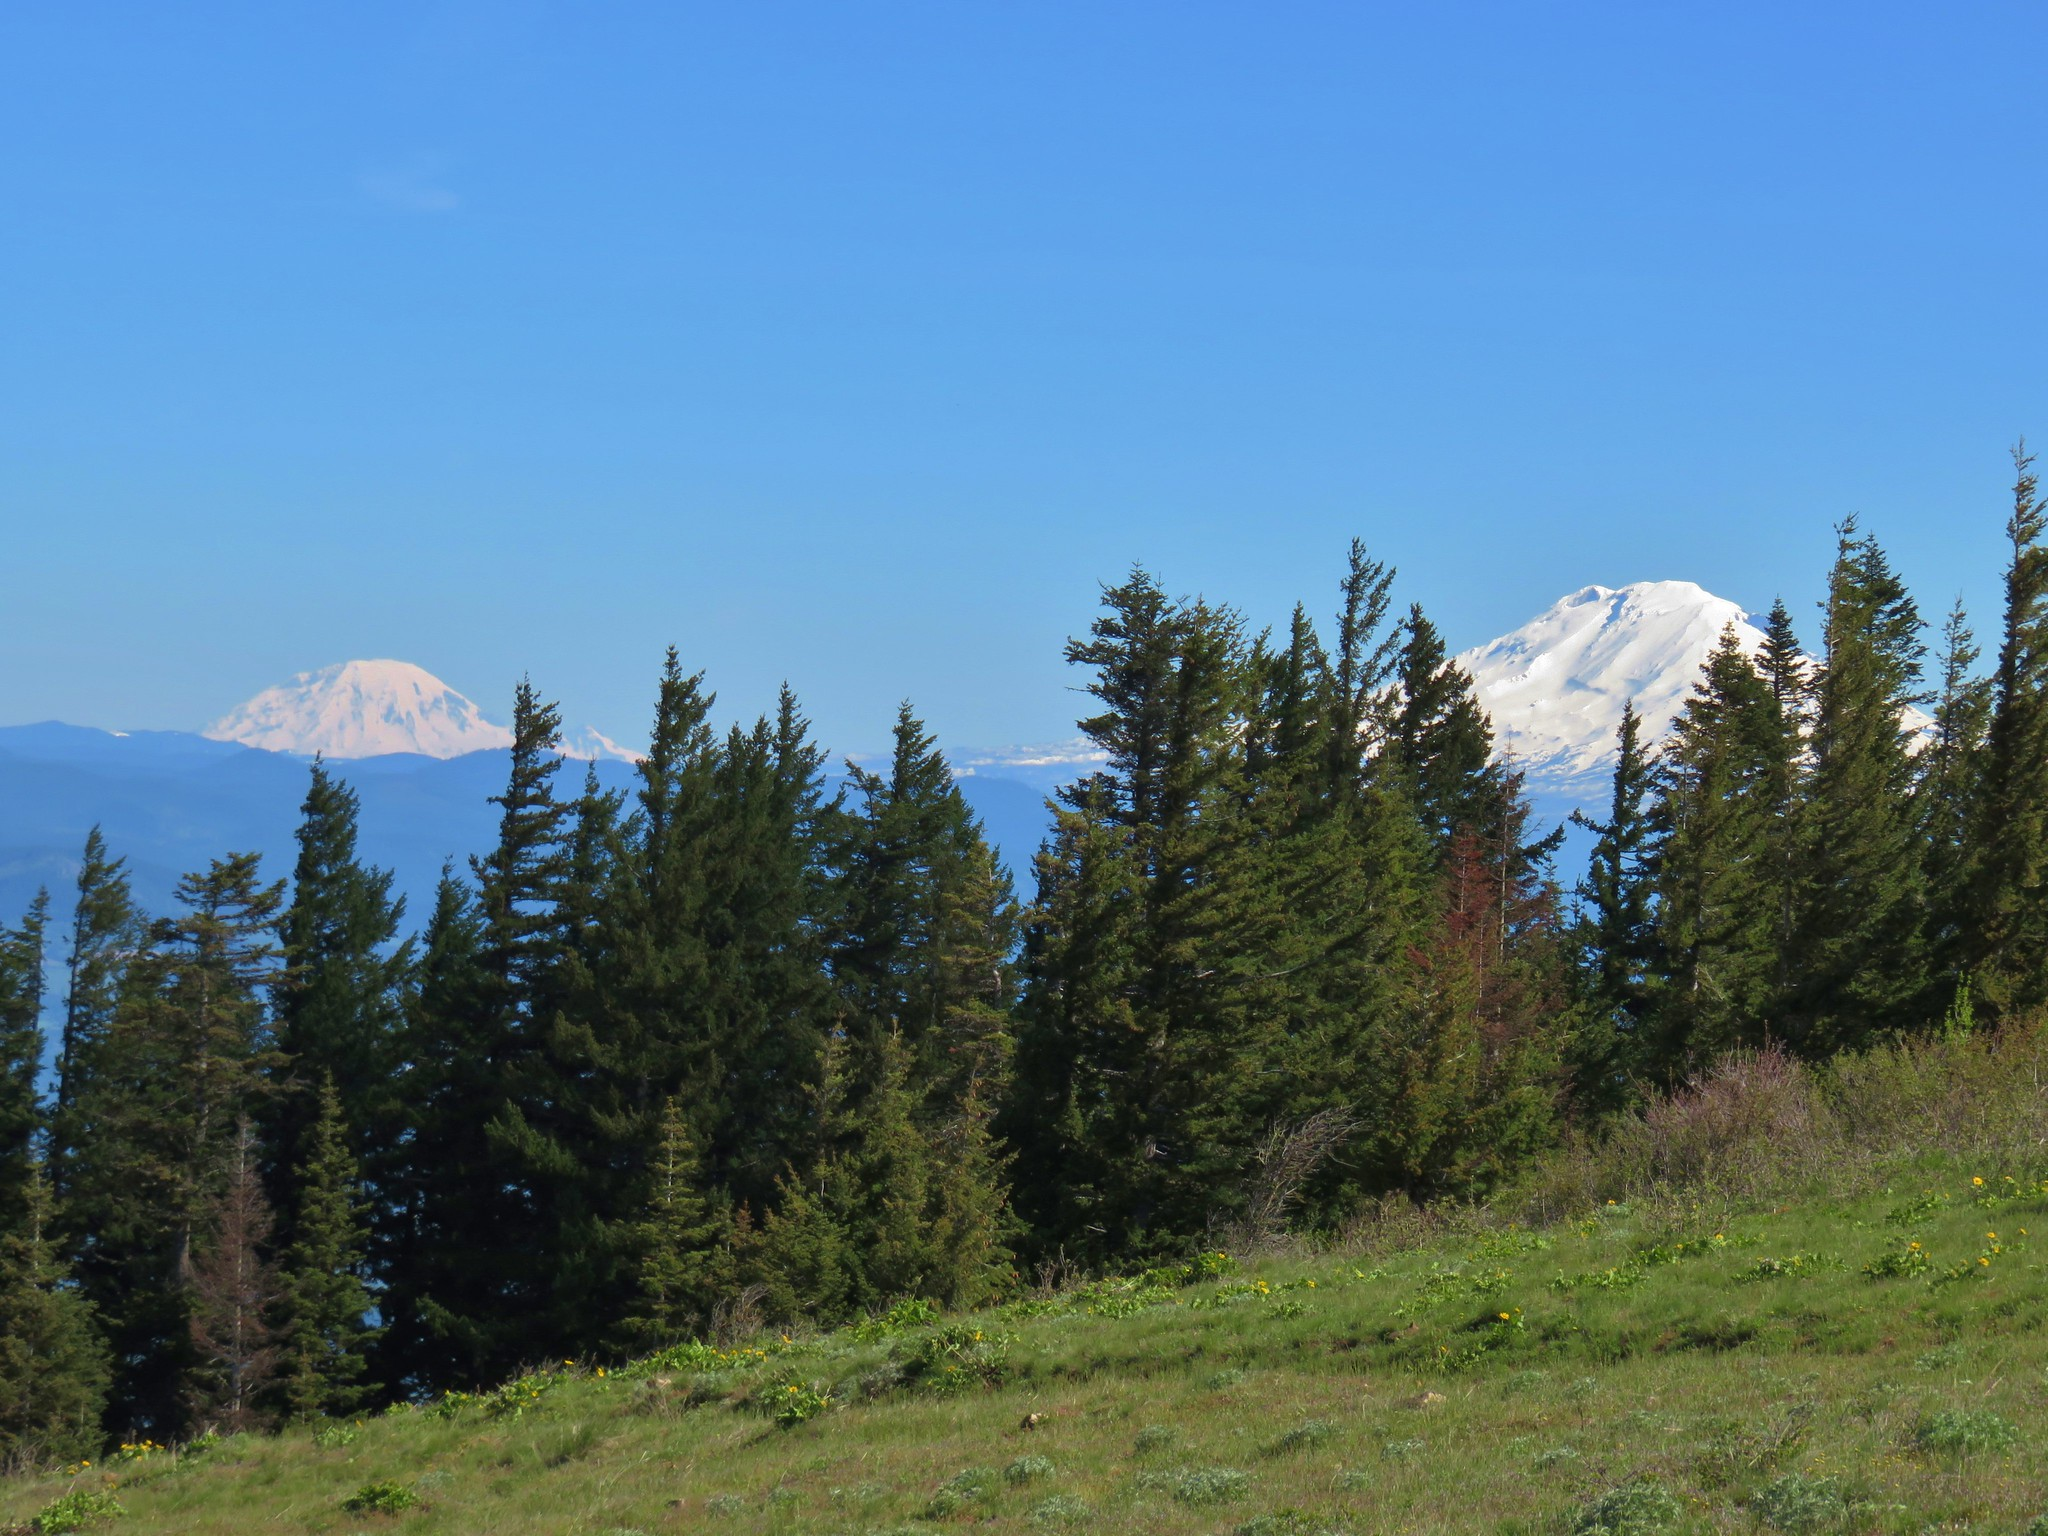 Mt. Rainier and Mt. Adams